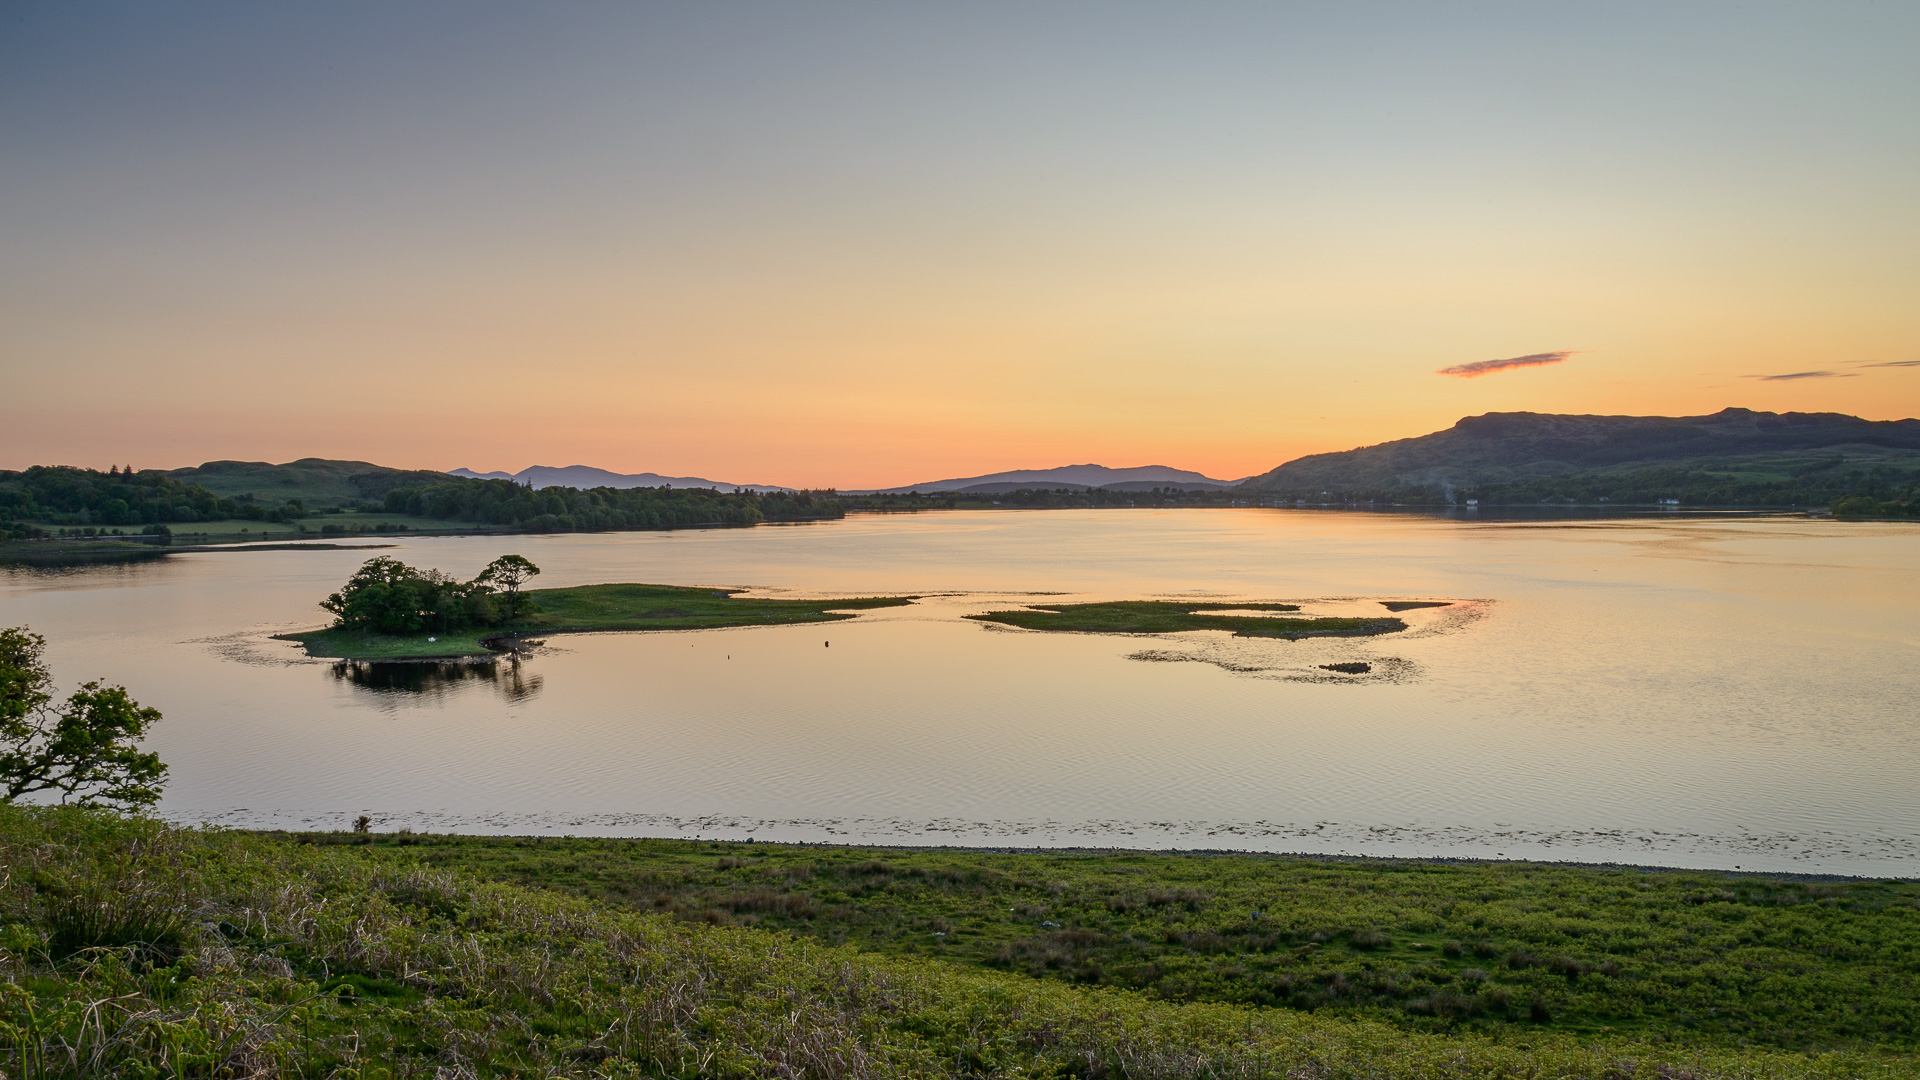 Sonennuntergang Loch Leven